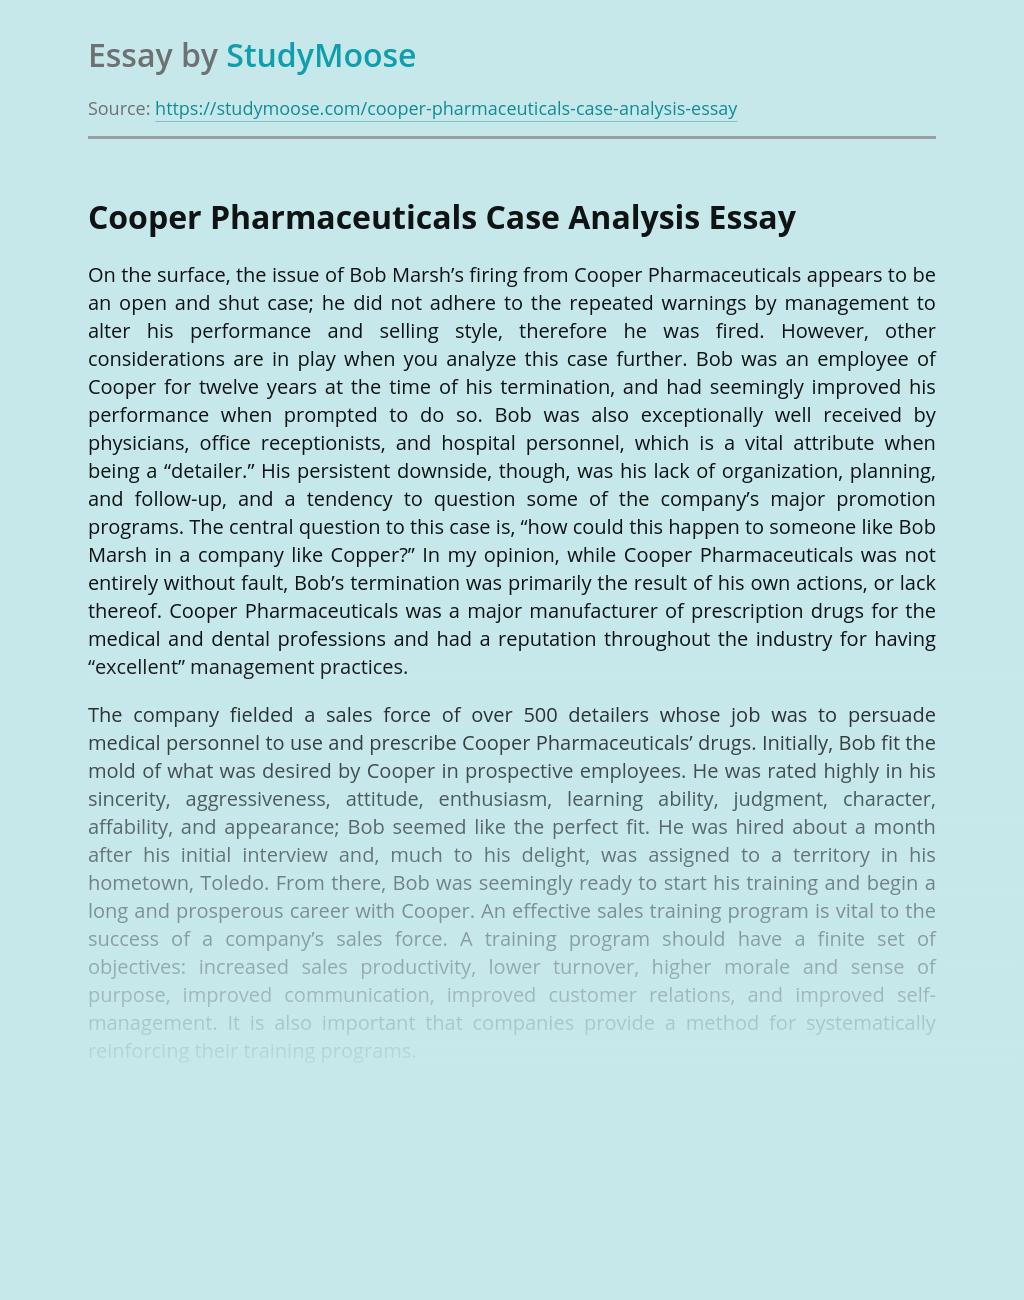 Cooper Pharmaceuticals Case Analysis